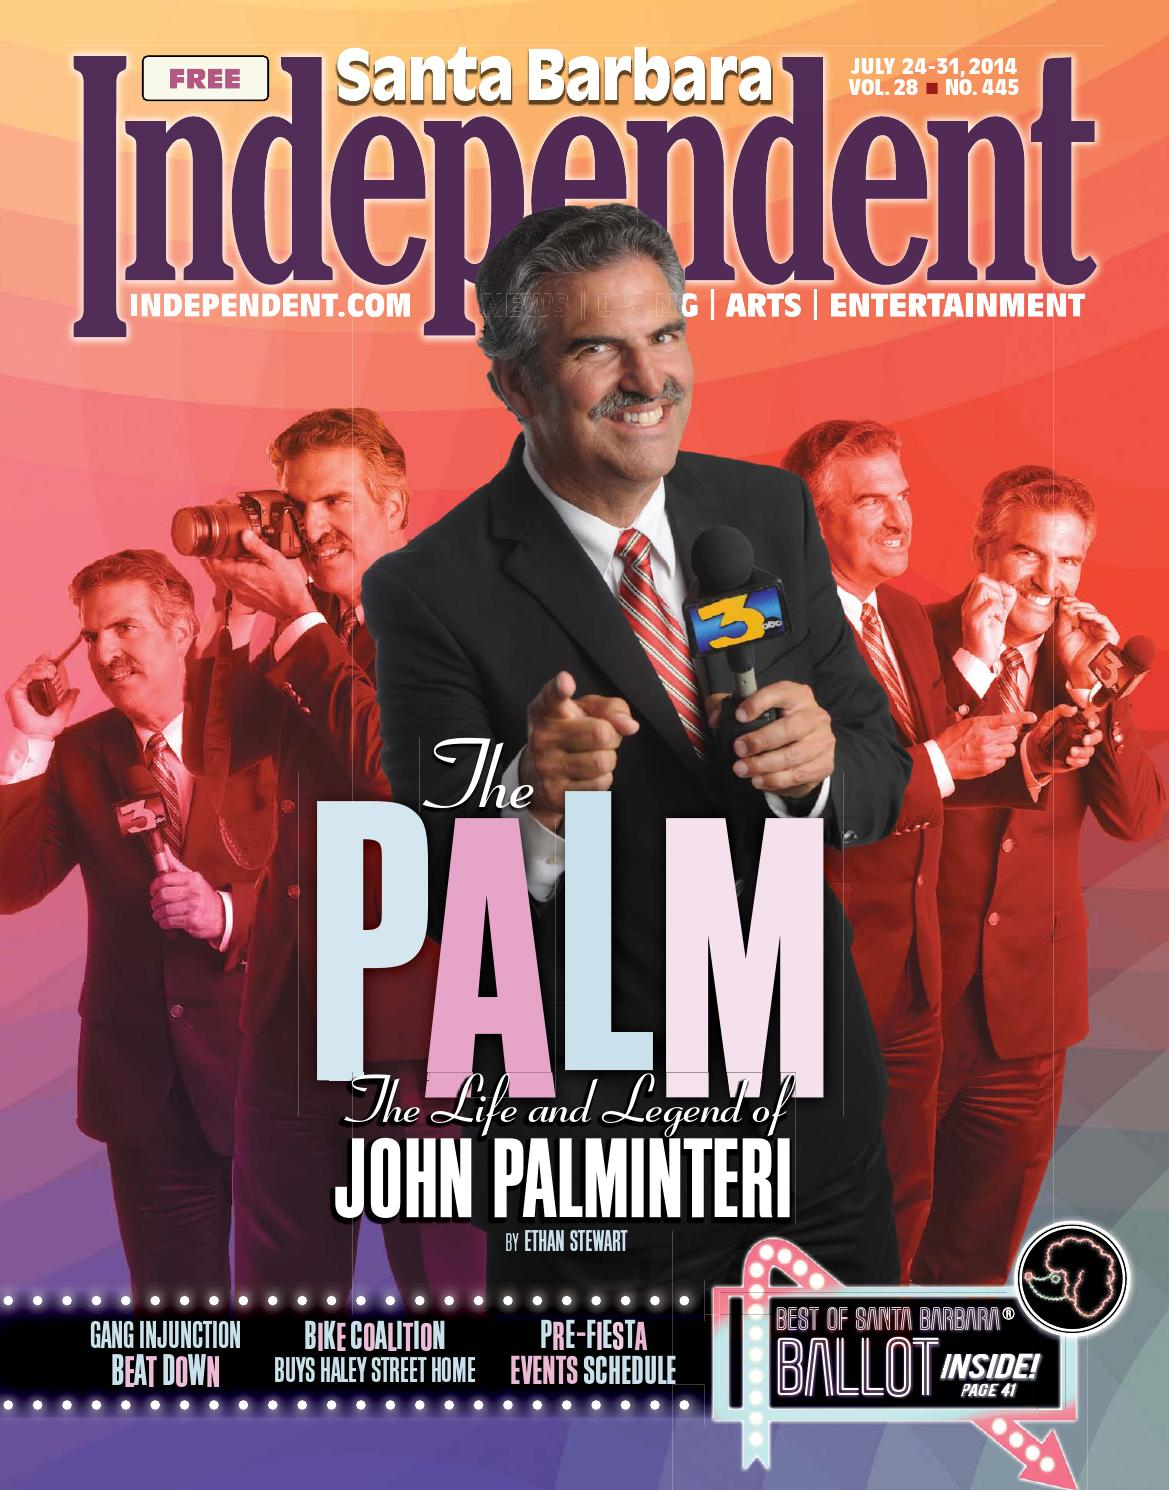 Santa Barbara Independent 07 24 14 By SB Independent Issuu